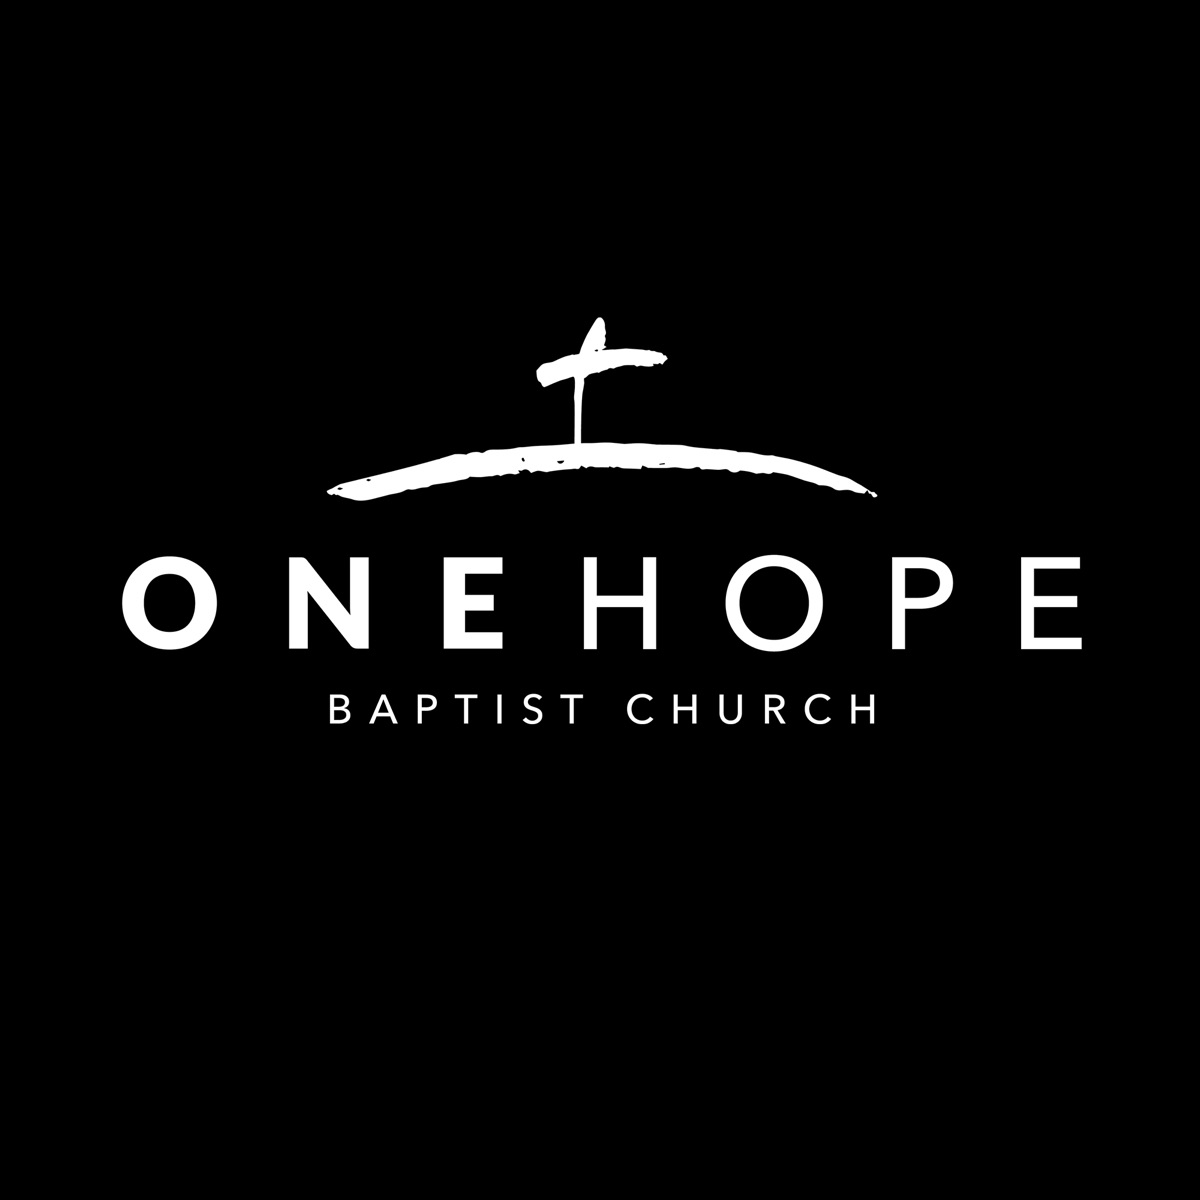 OneHope Baptist Church